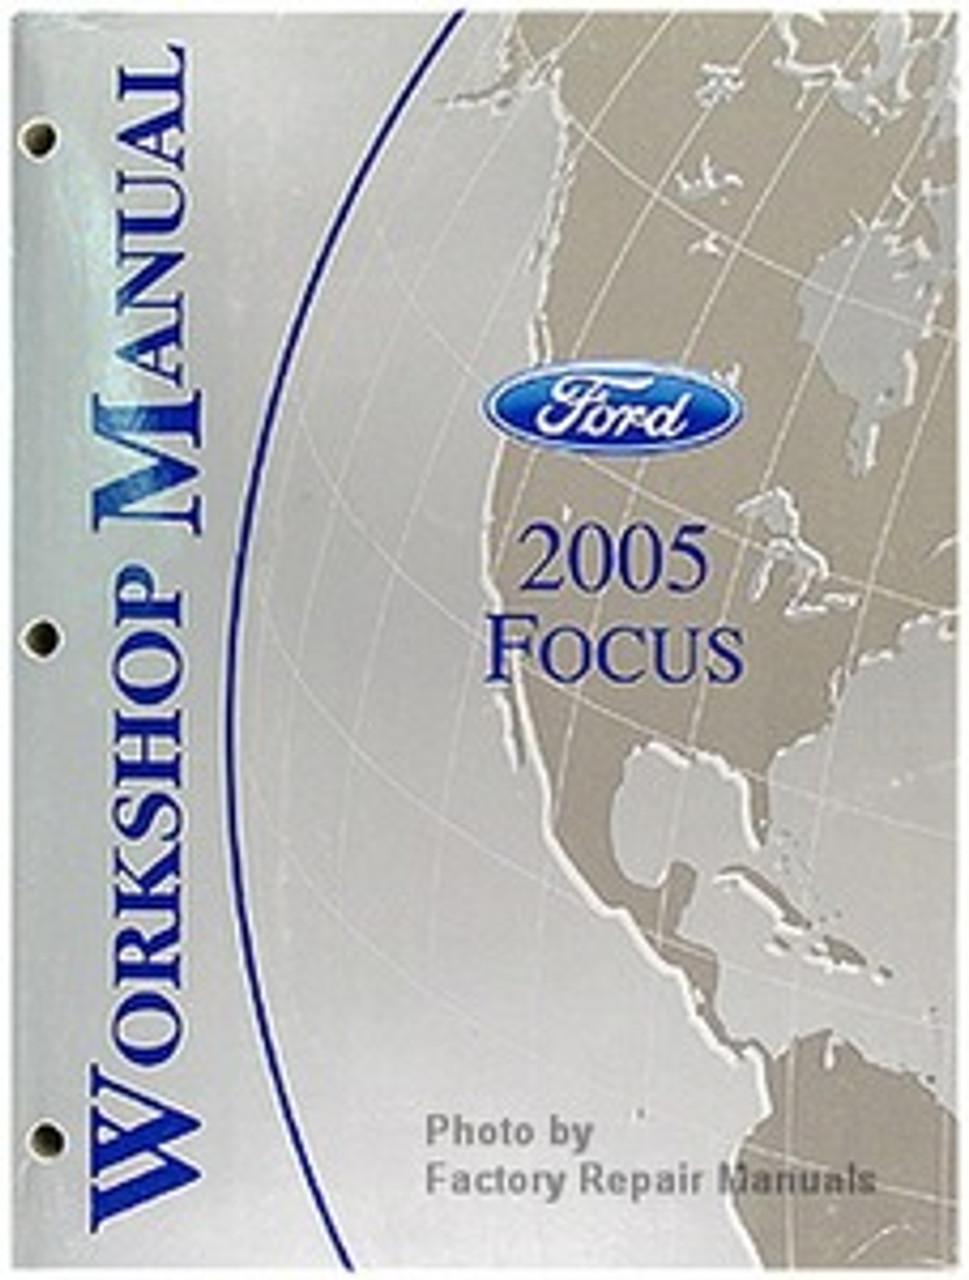 Motors Other Car Manuals research.unir.net 2005 Lincoln Aviator ...